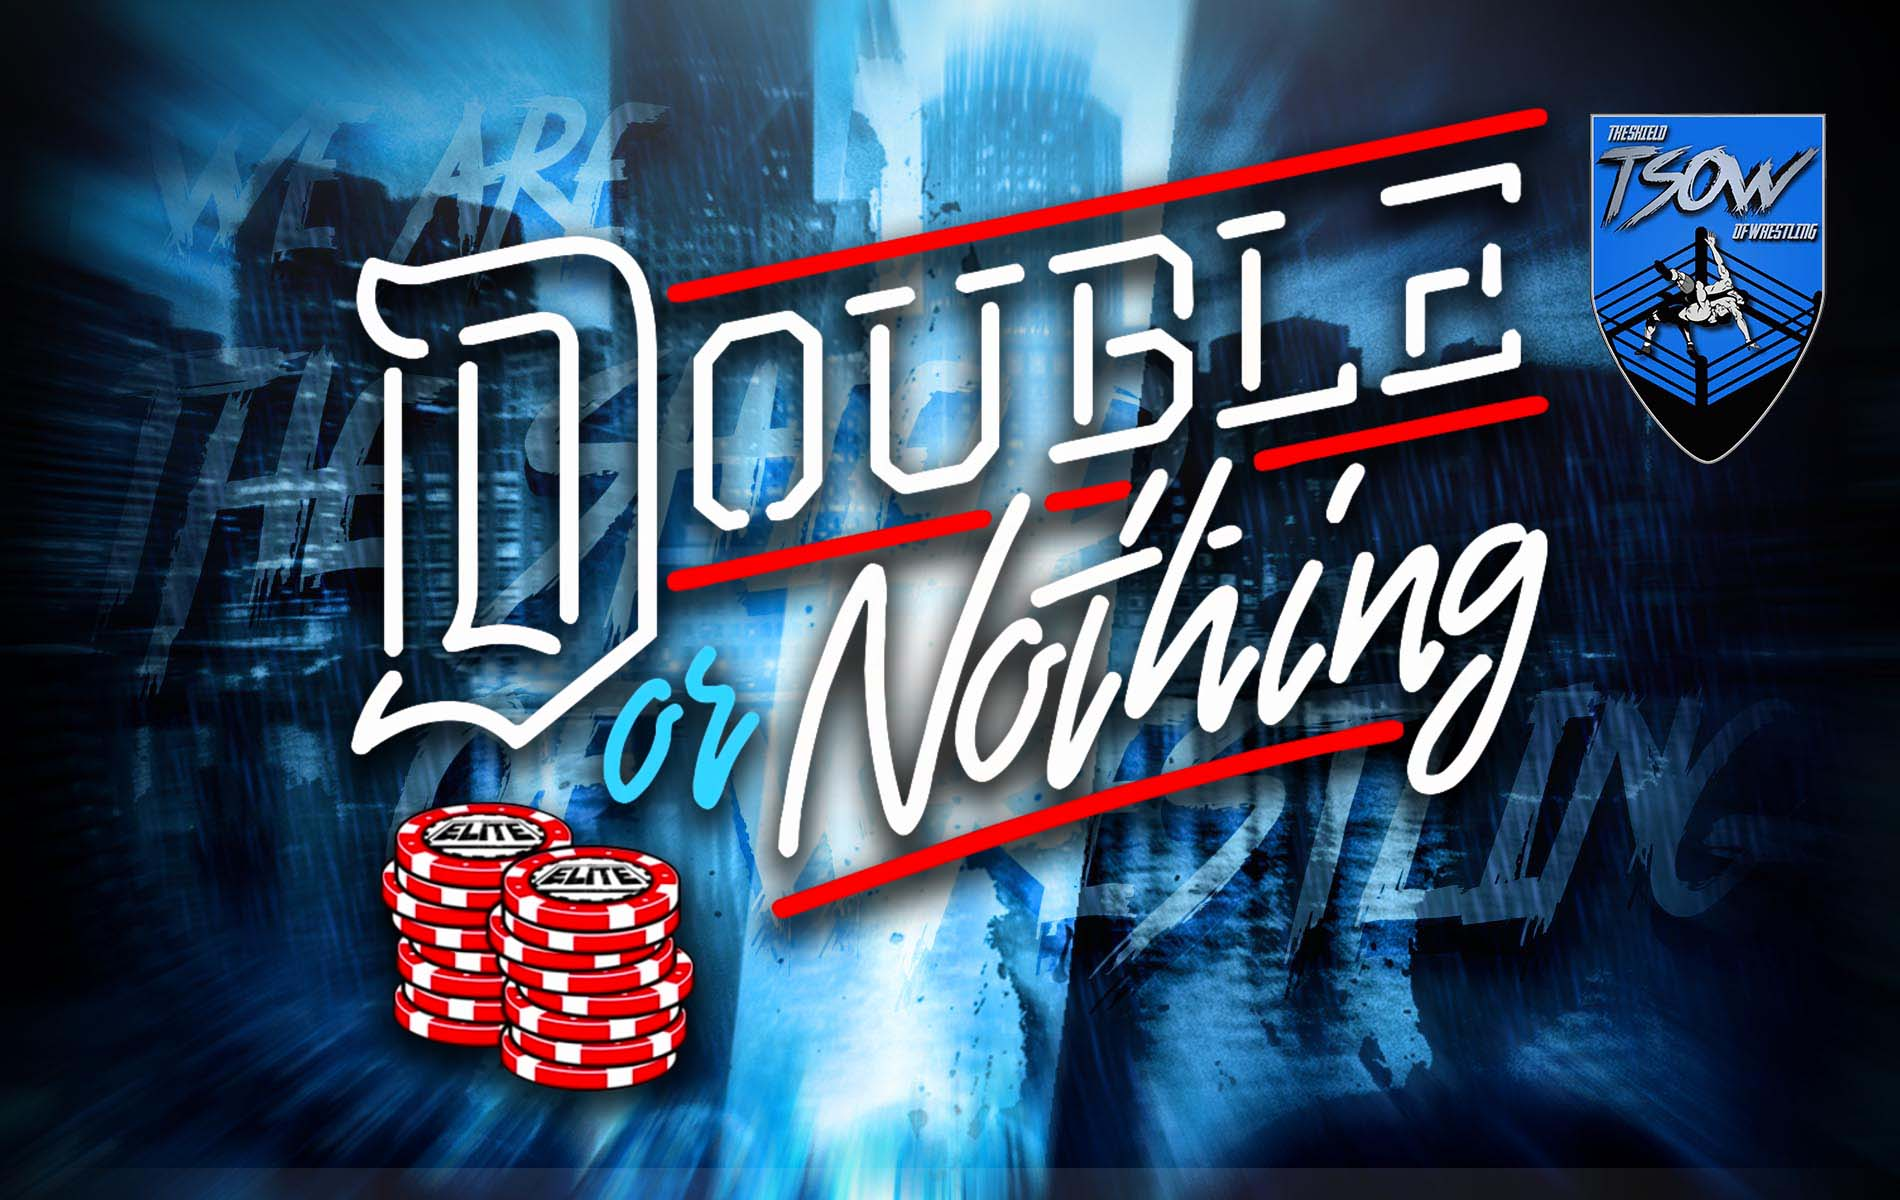 Moxley - Kingston vs Young Bucks: ufficiale per DoN